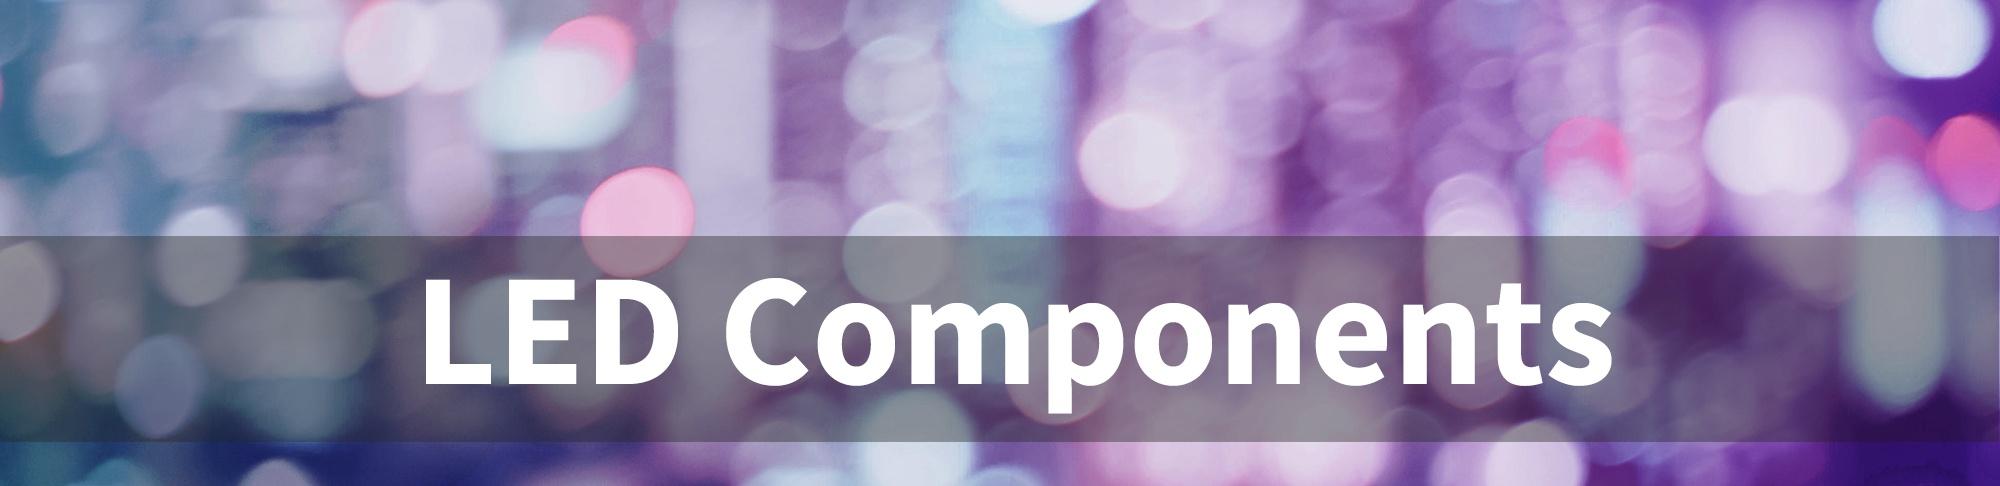 ledcomponents.jpg